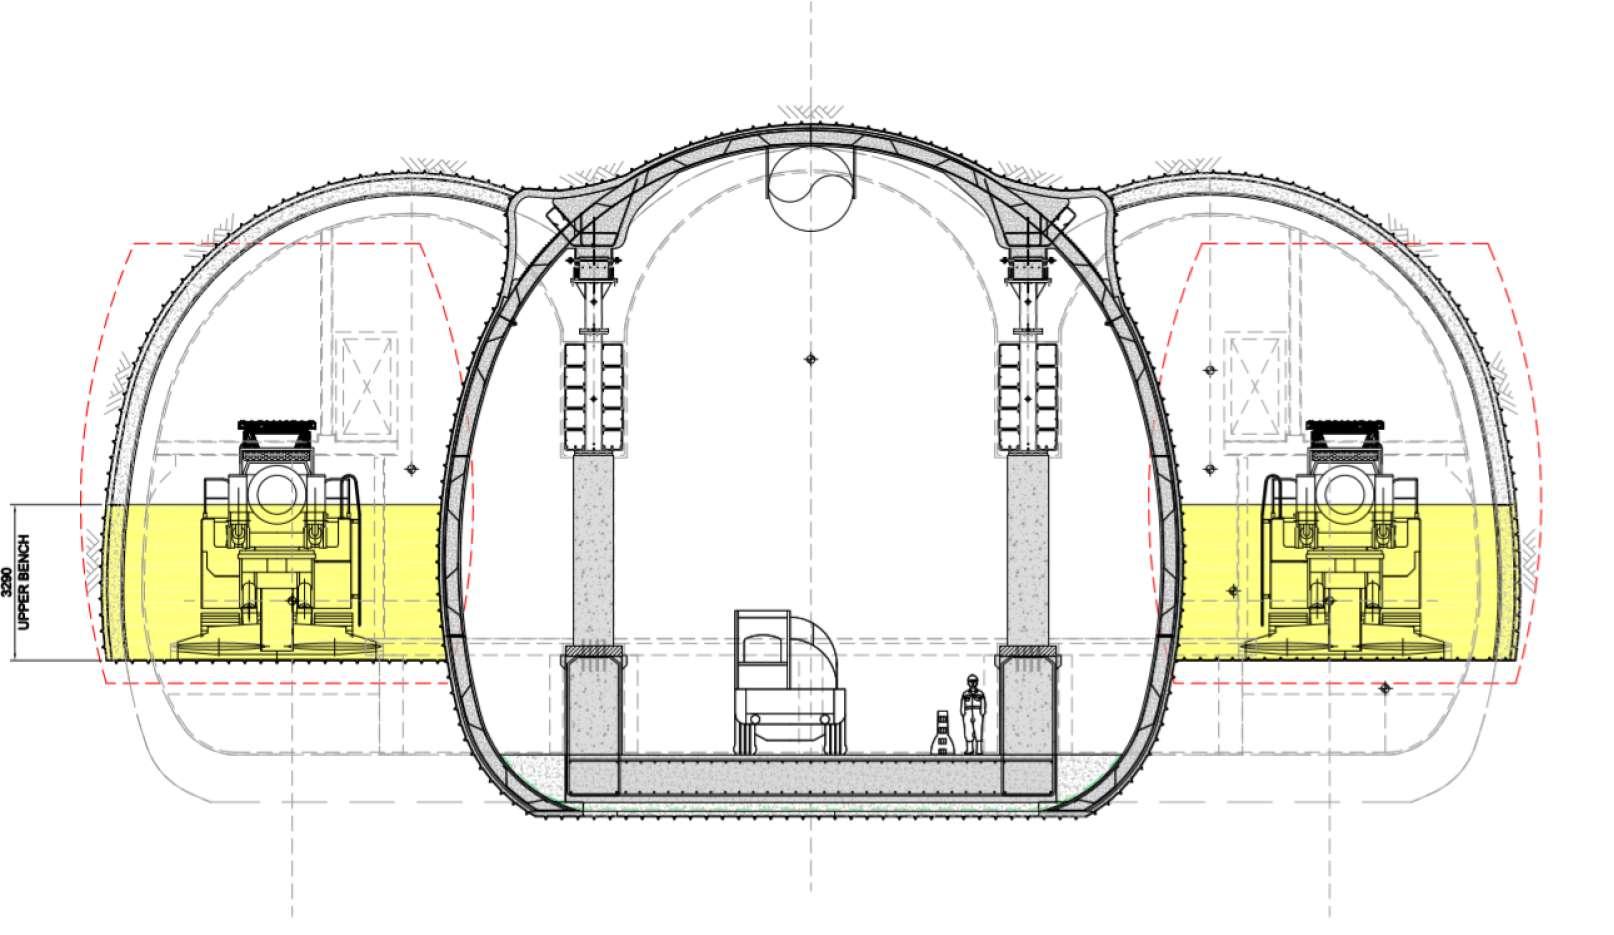 Trinocular cavern construction methodology